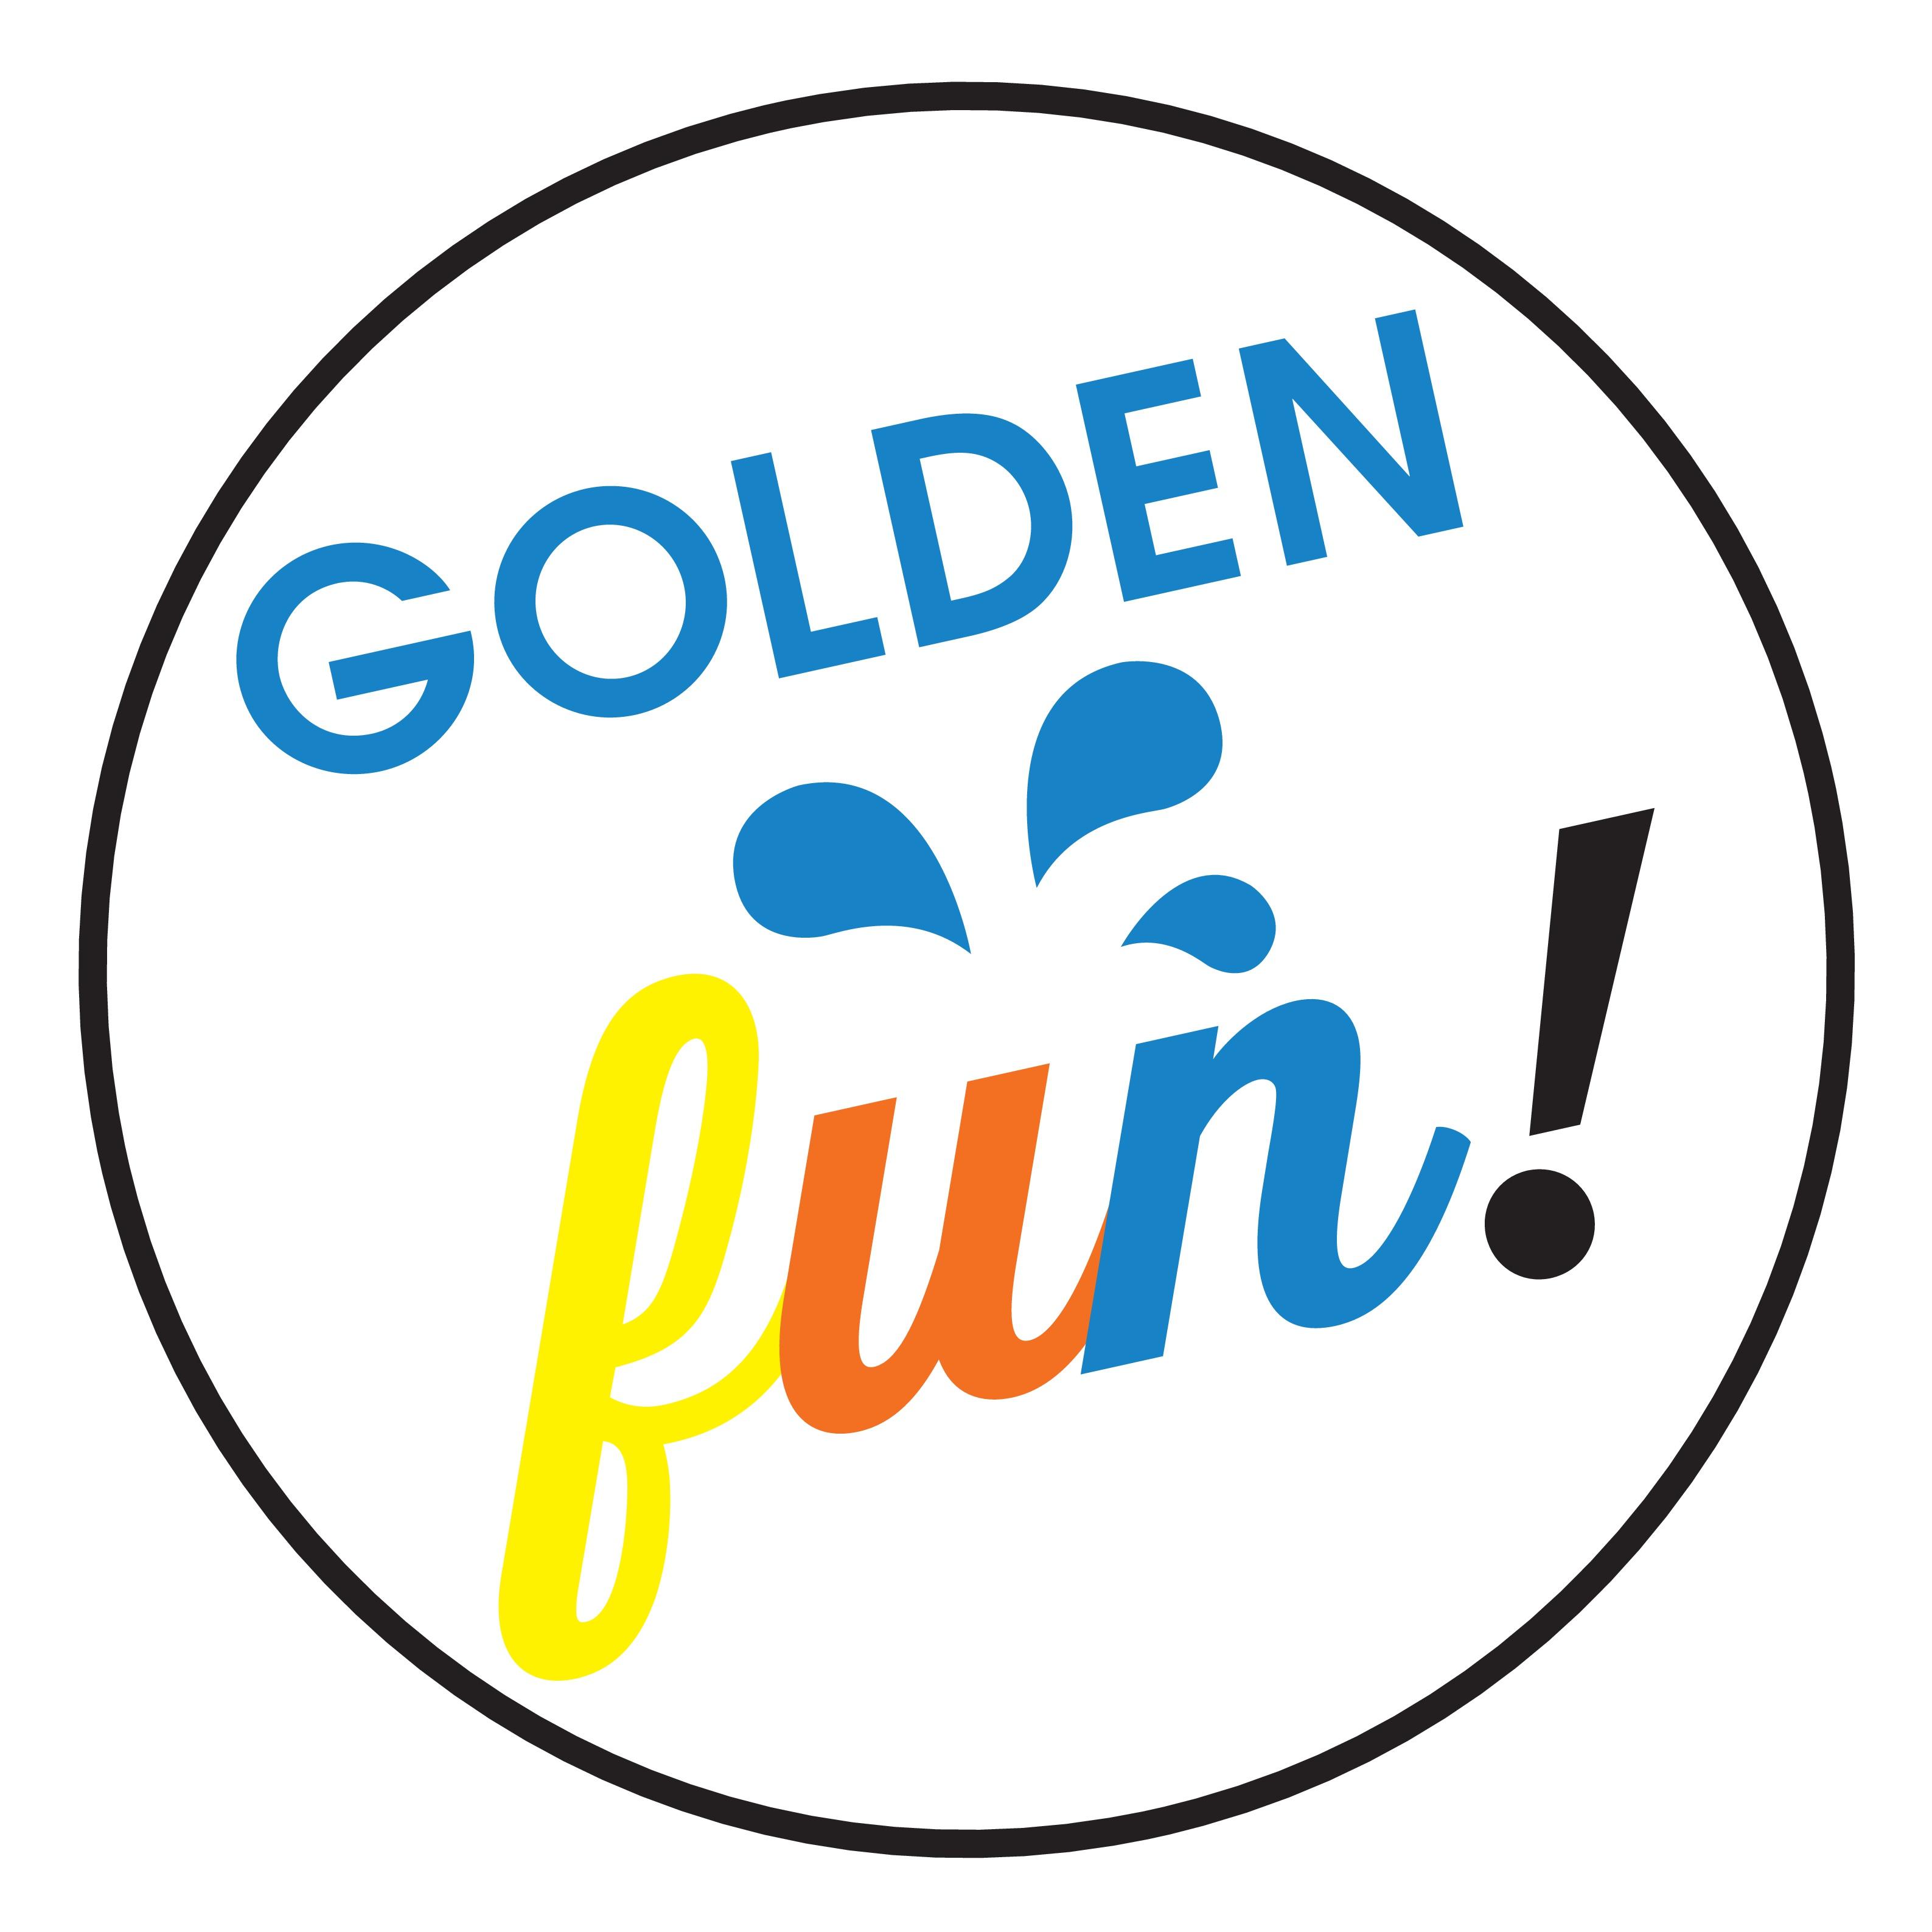 goldenfun